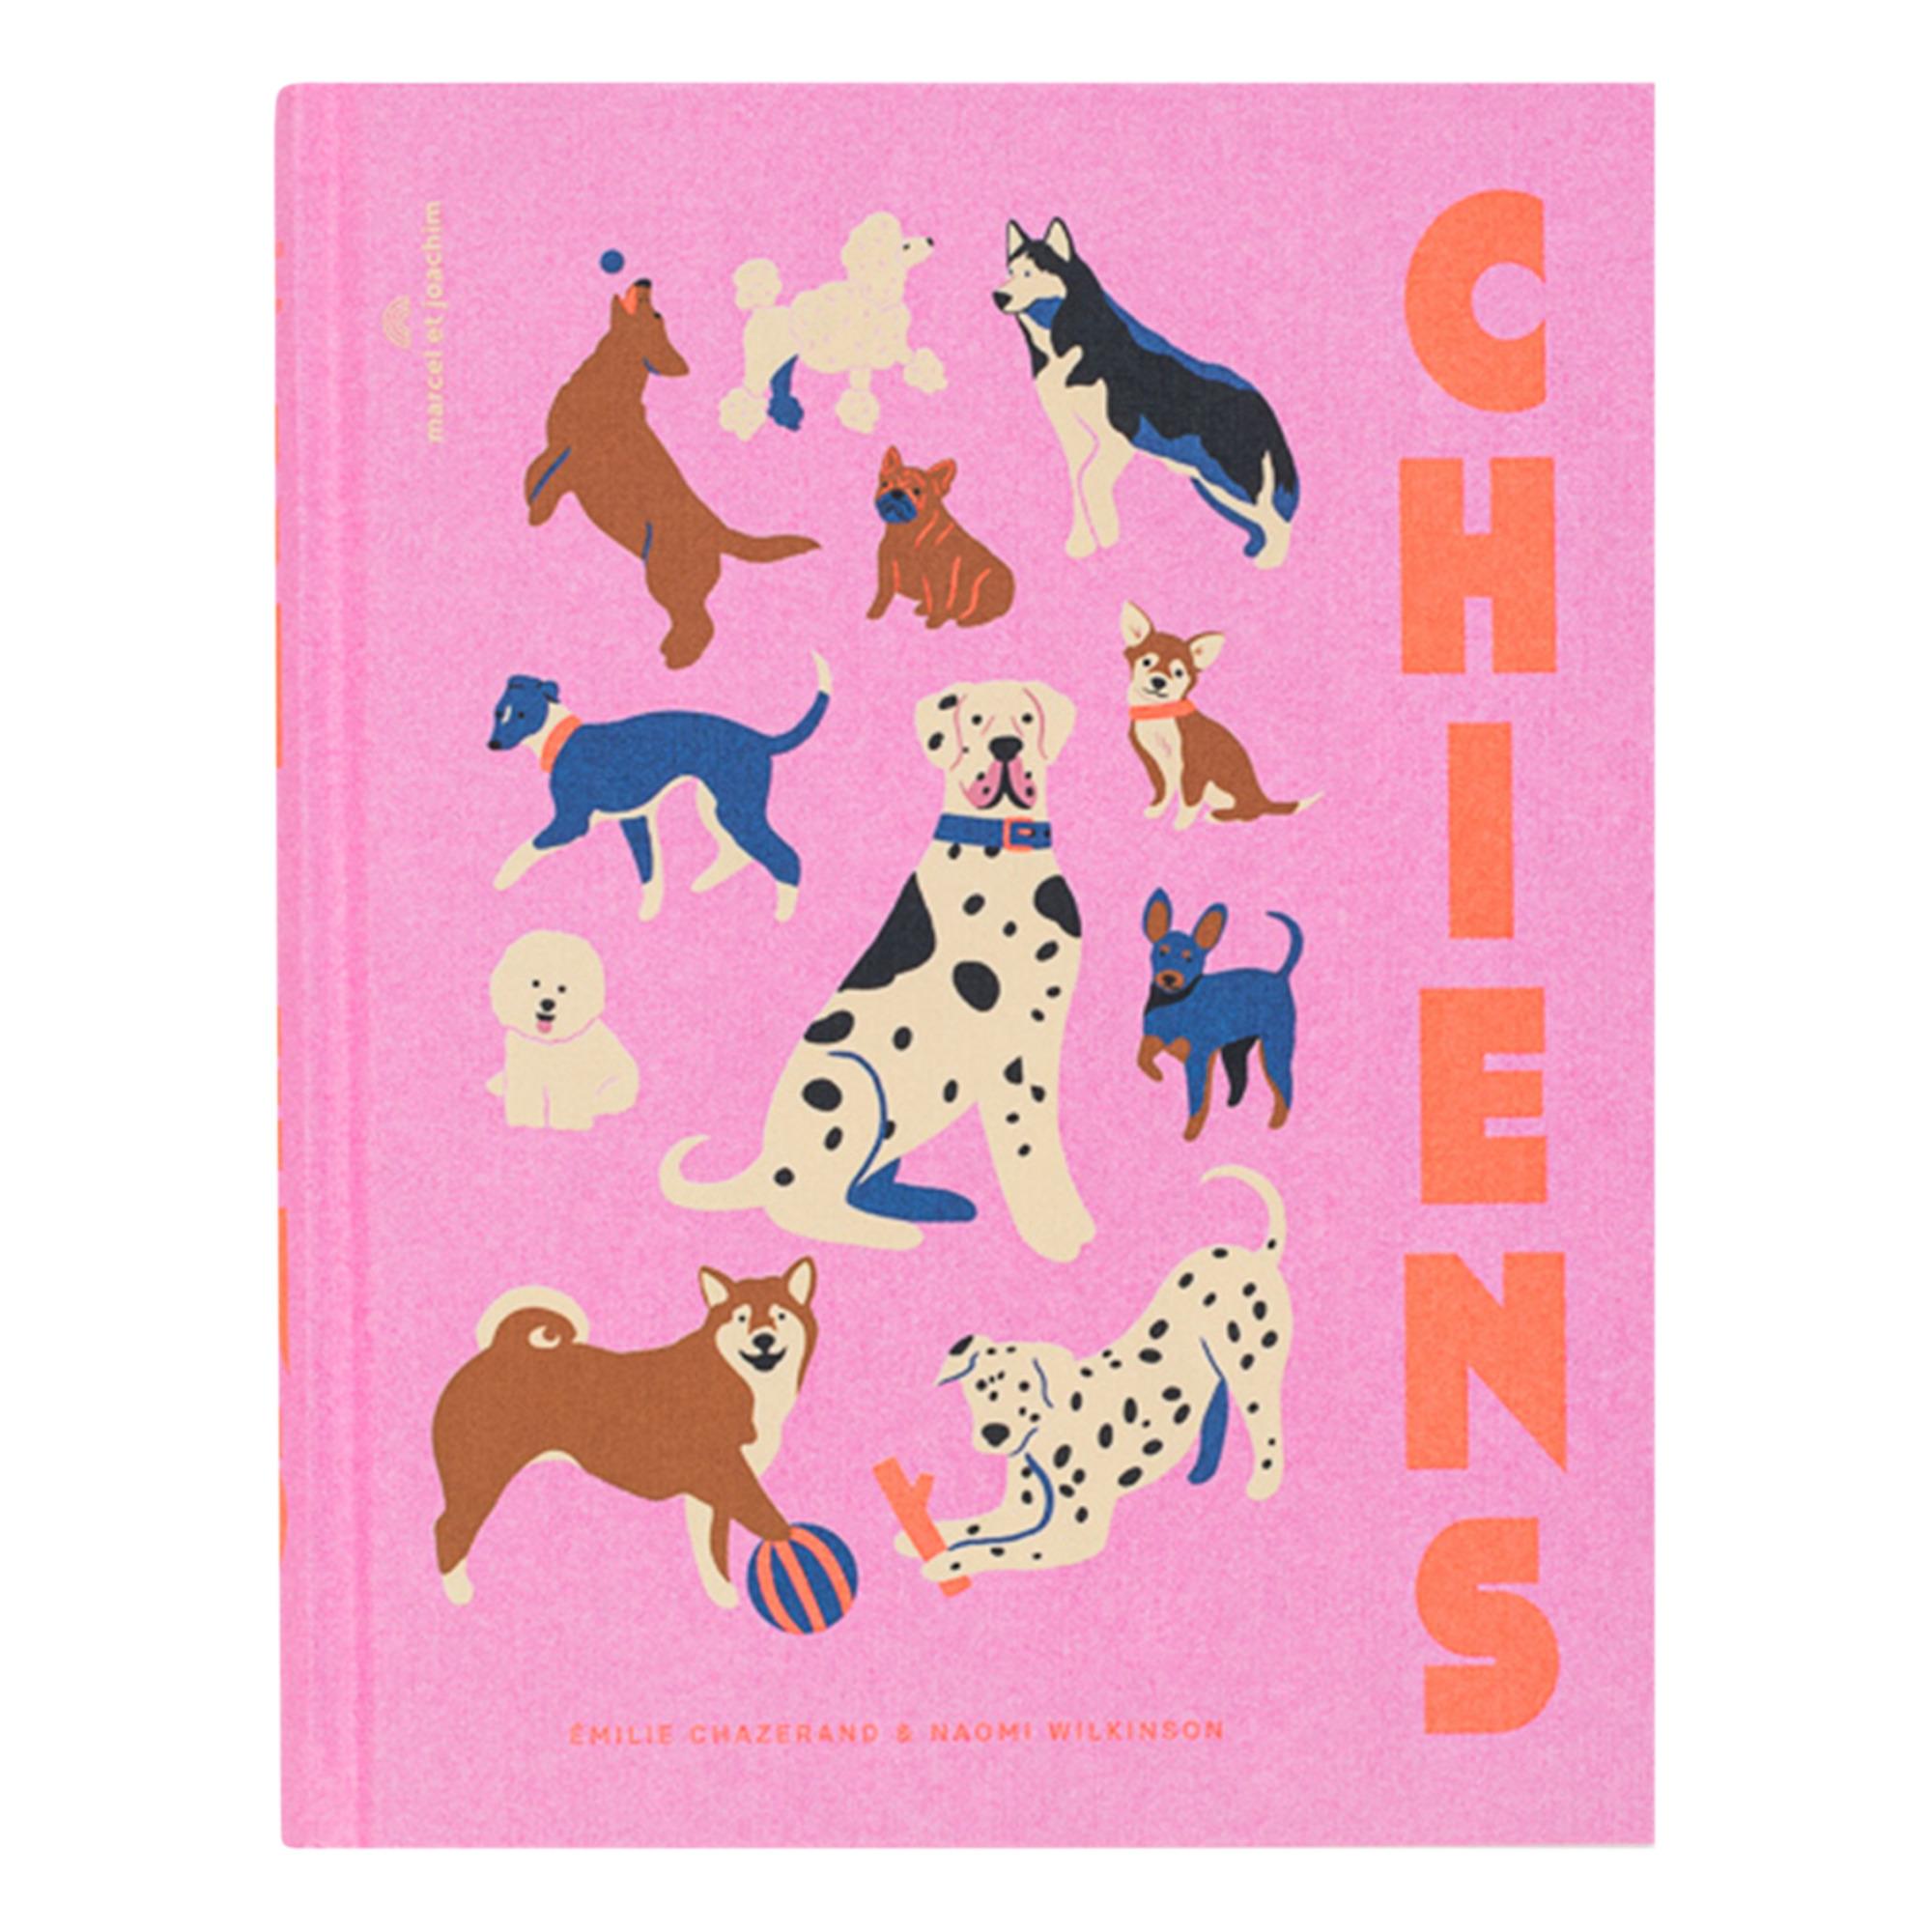 livre-chiens-e-chazerand-n-wilkinson